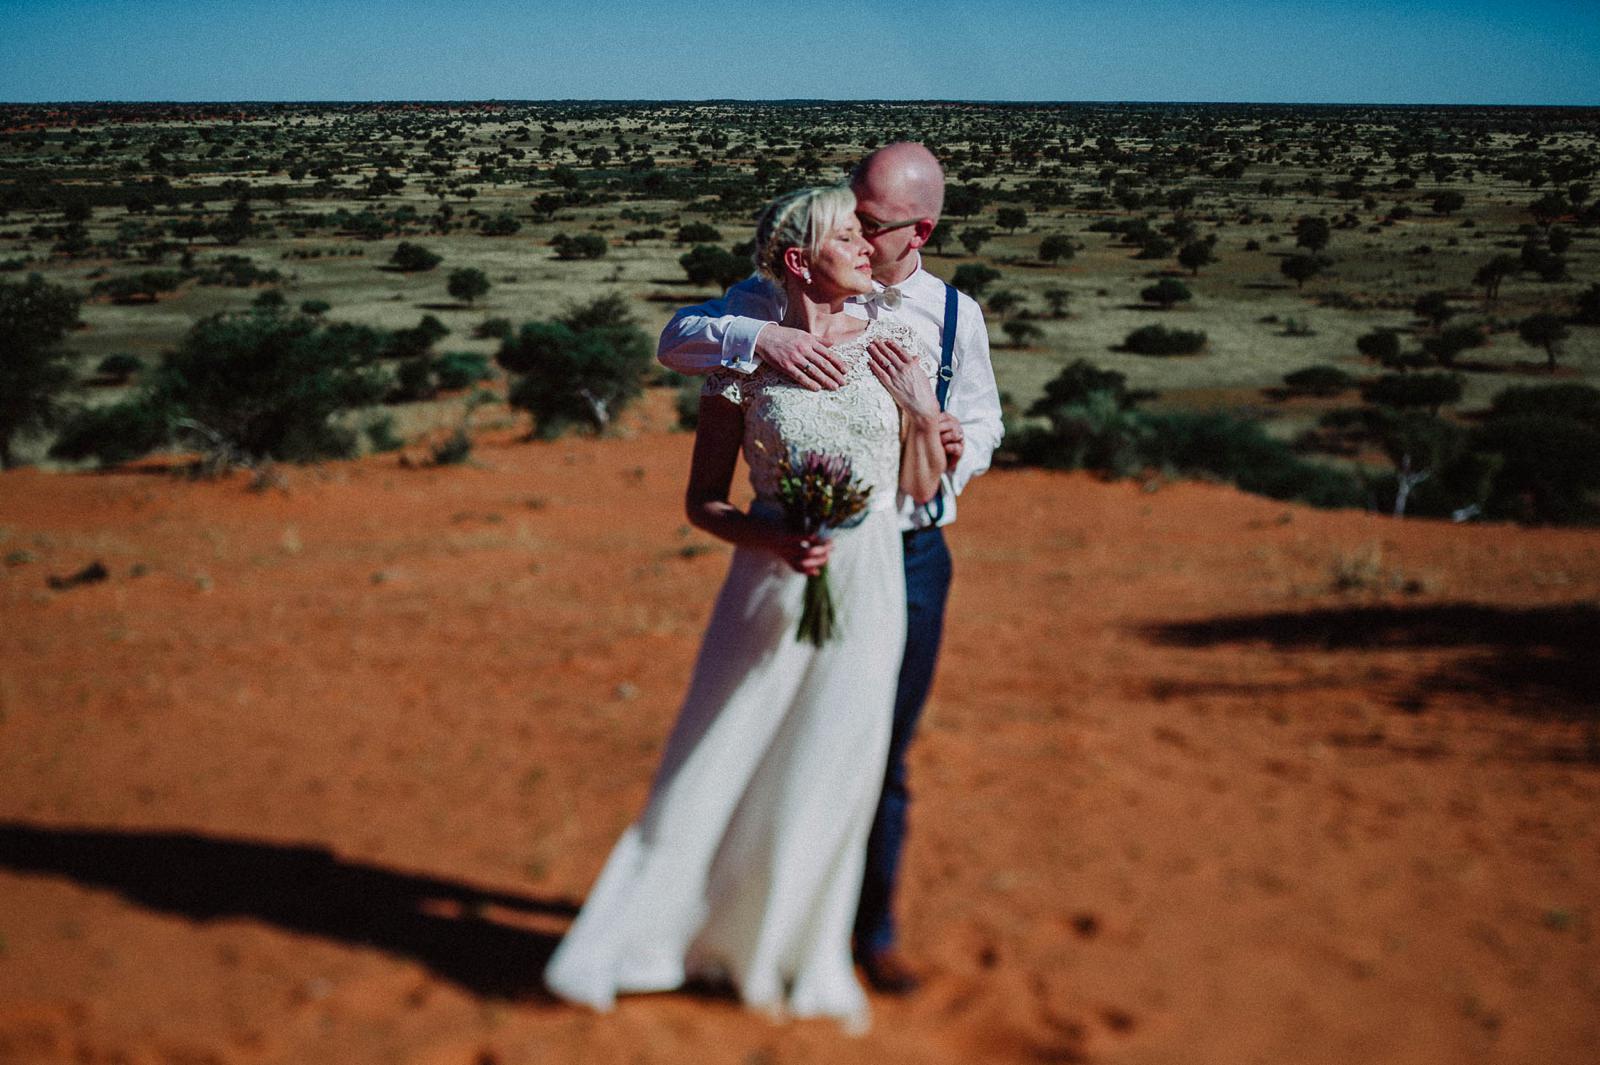 heiraten-in-namibia-7521-2.jpg